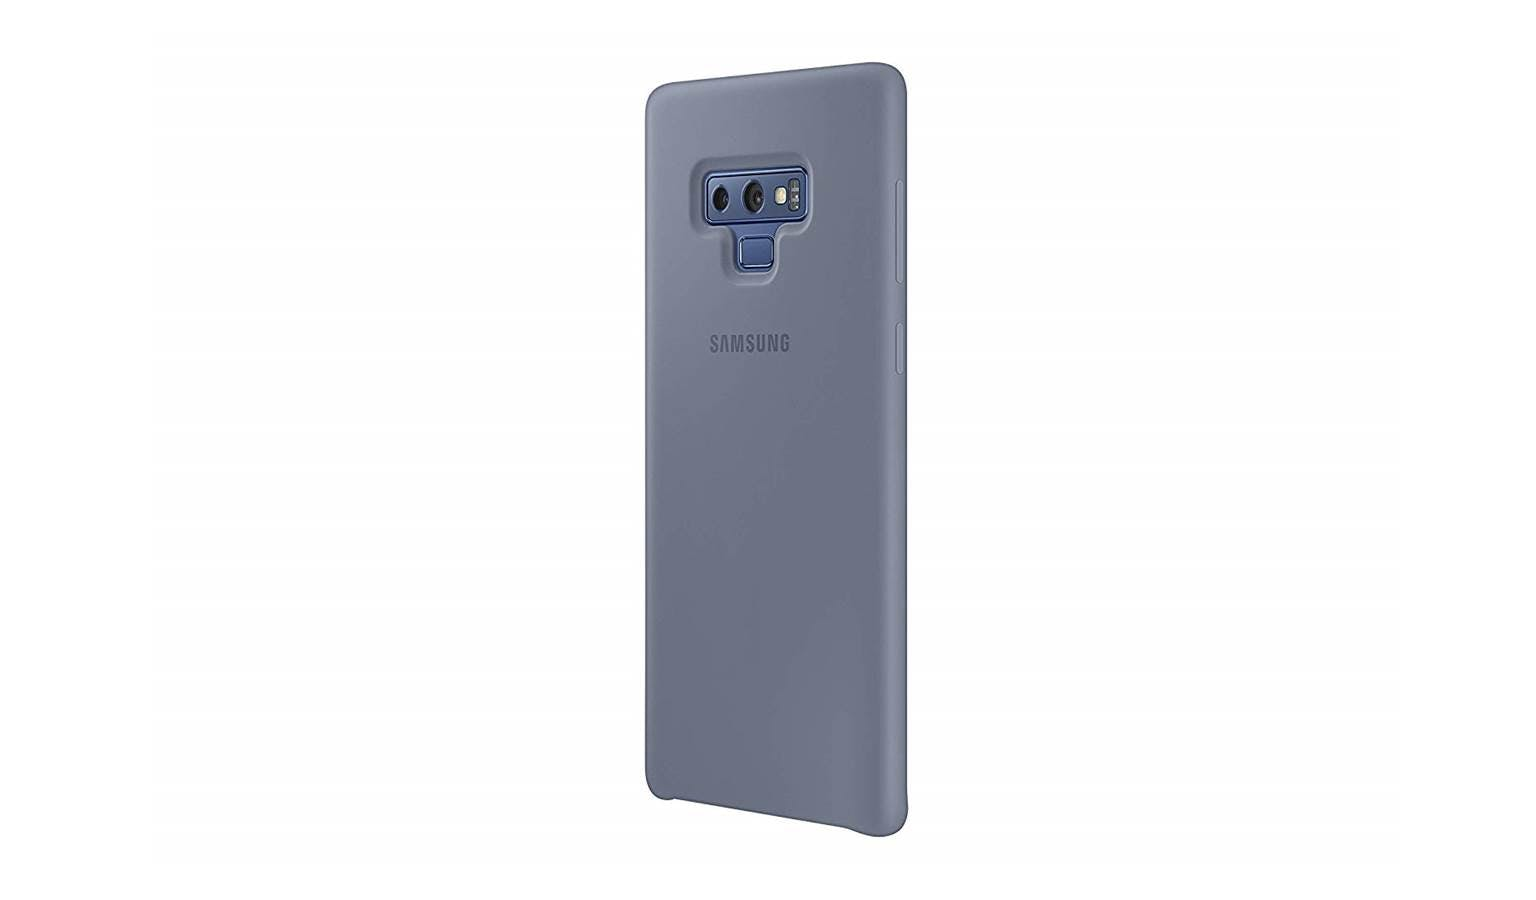 new style 905e9 bc55a Samsung Galaxy Note 9 Silicon Cover - Blue